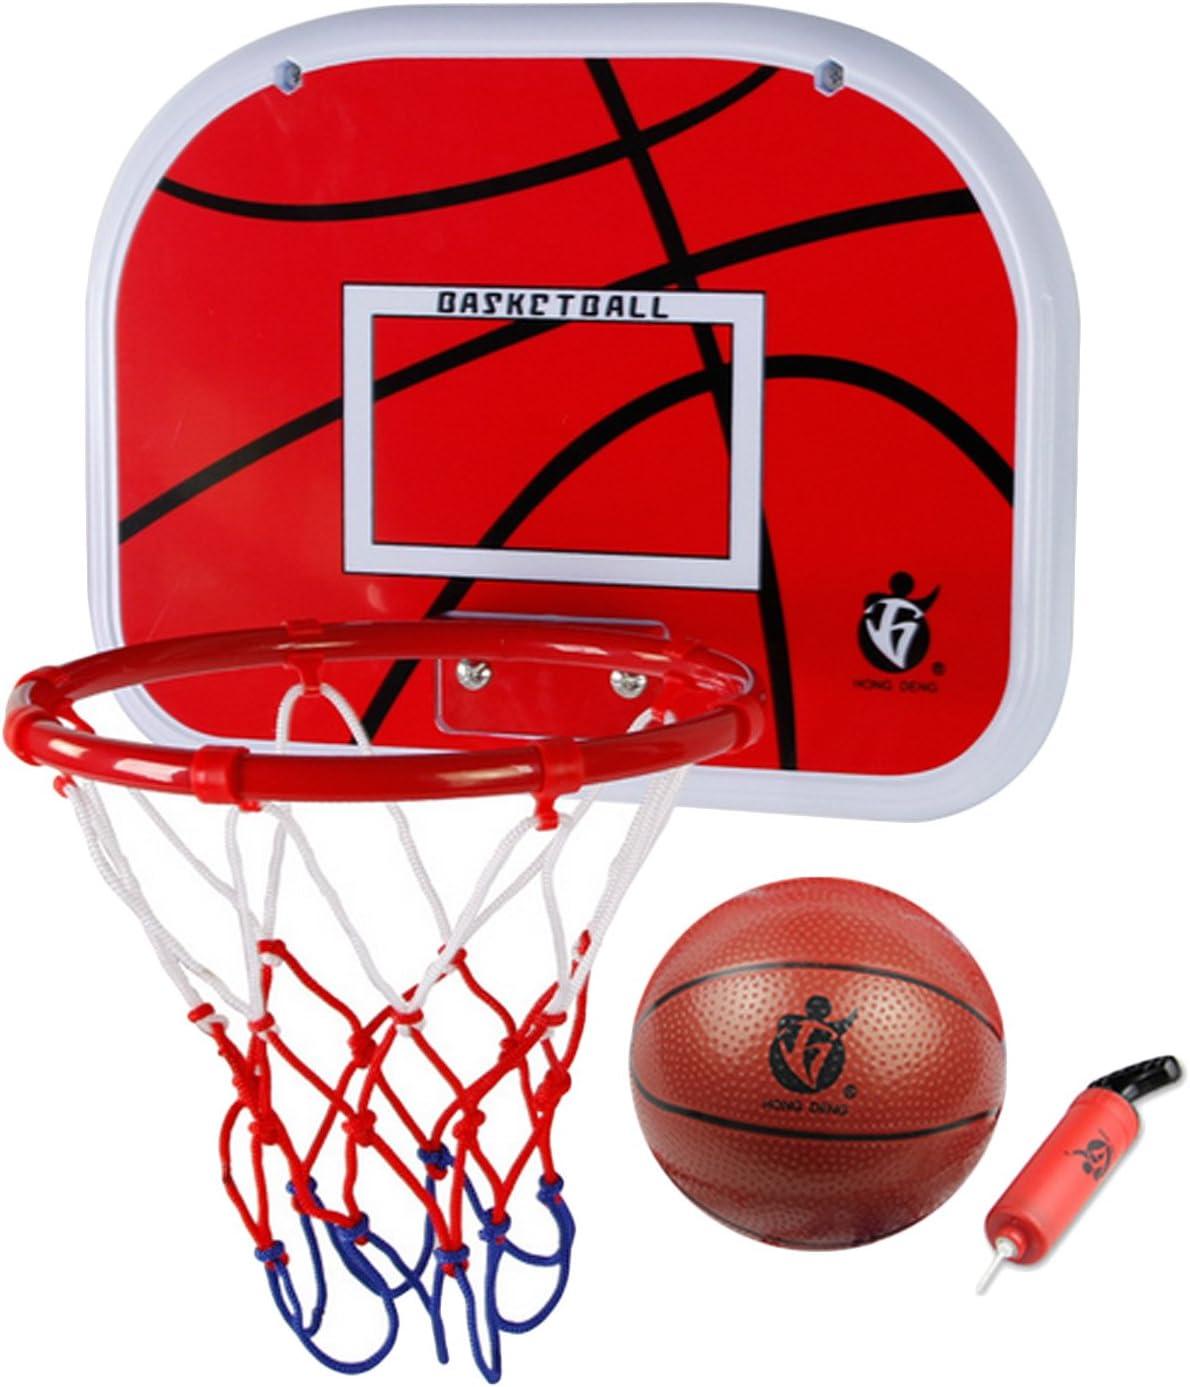 Canasta Baloncesto Pared,Mini Canasta,Mini Aro De Baloncesto Con ...